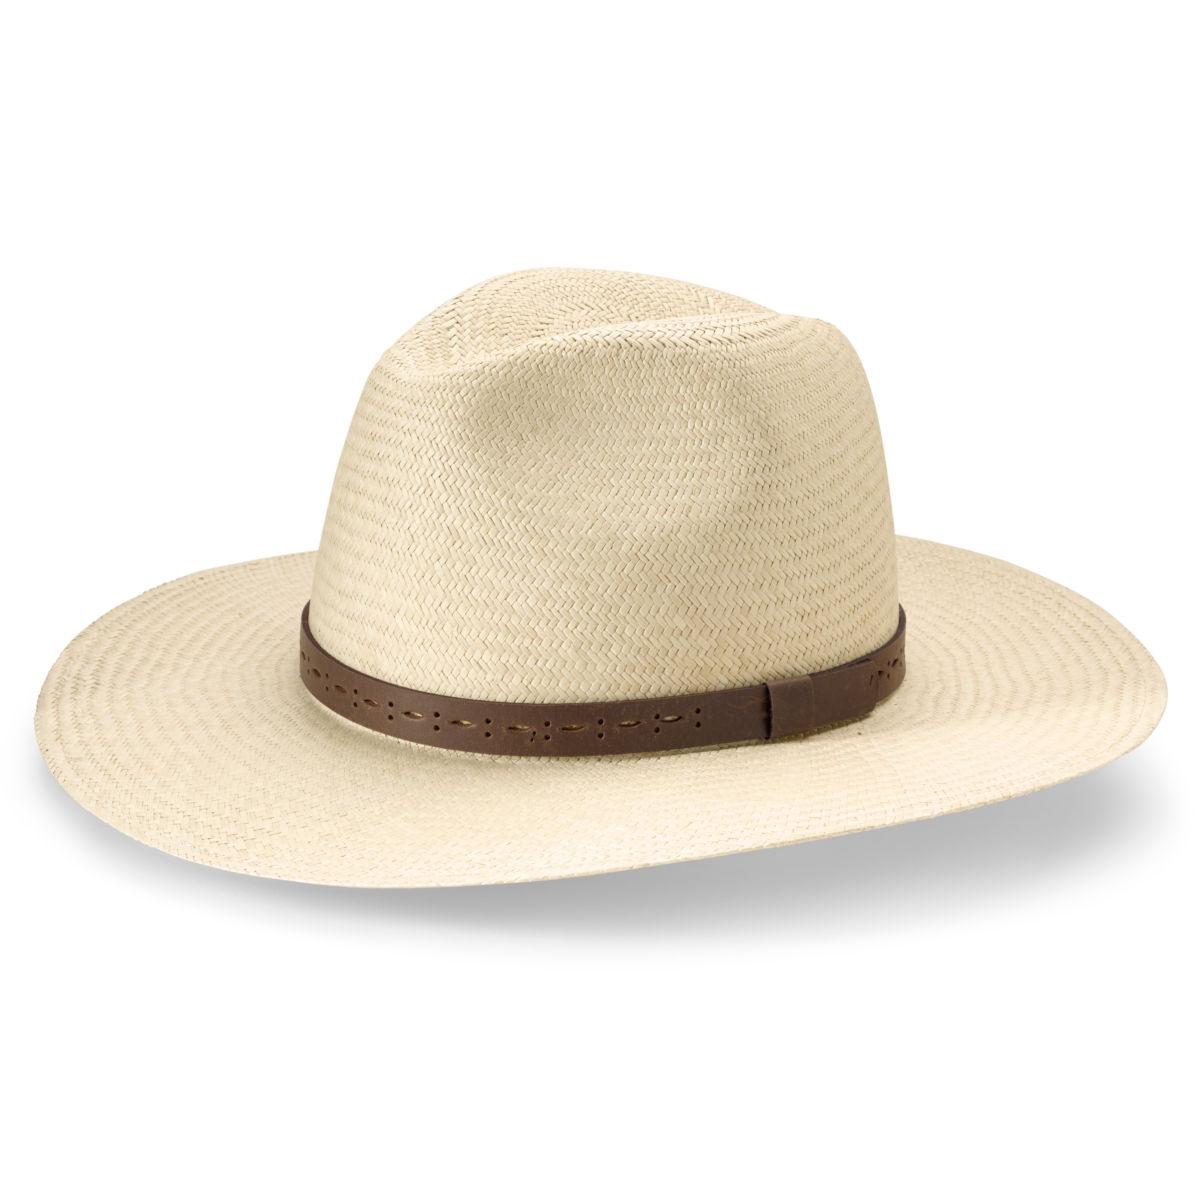 Sandestin Panama Straw Hat - image number 0